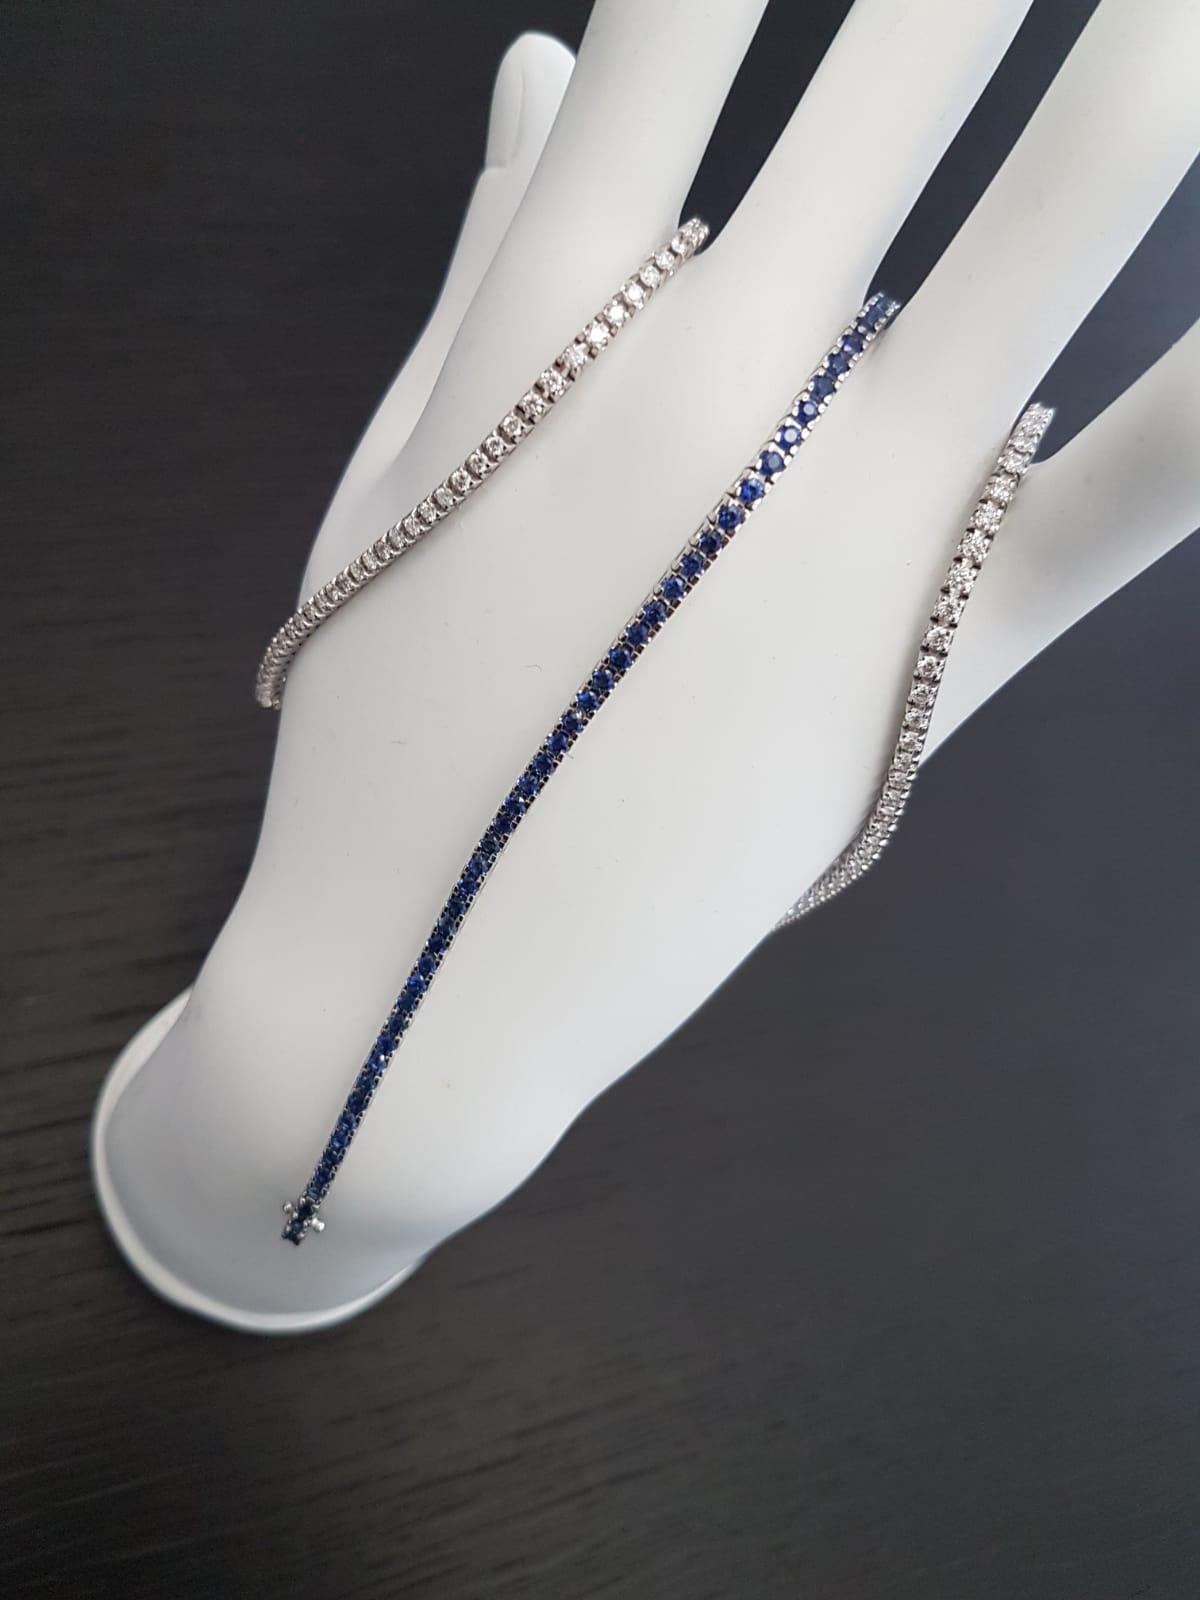 Tennis bracelet